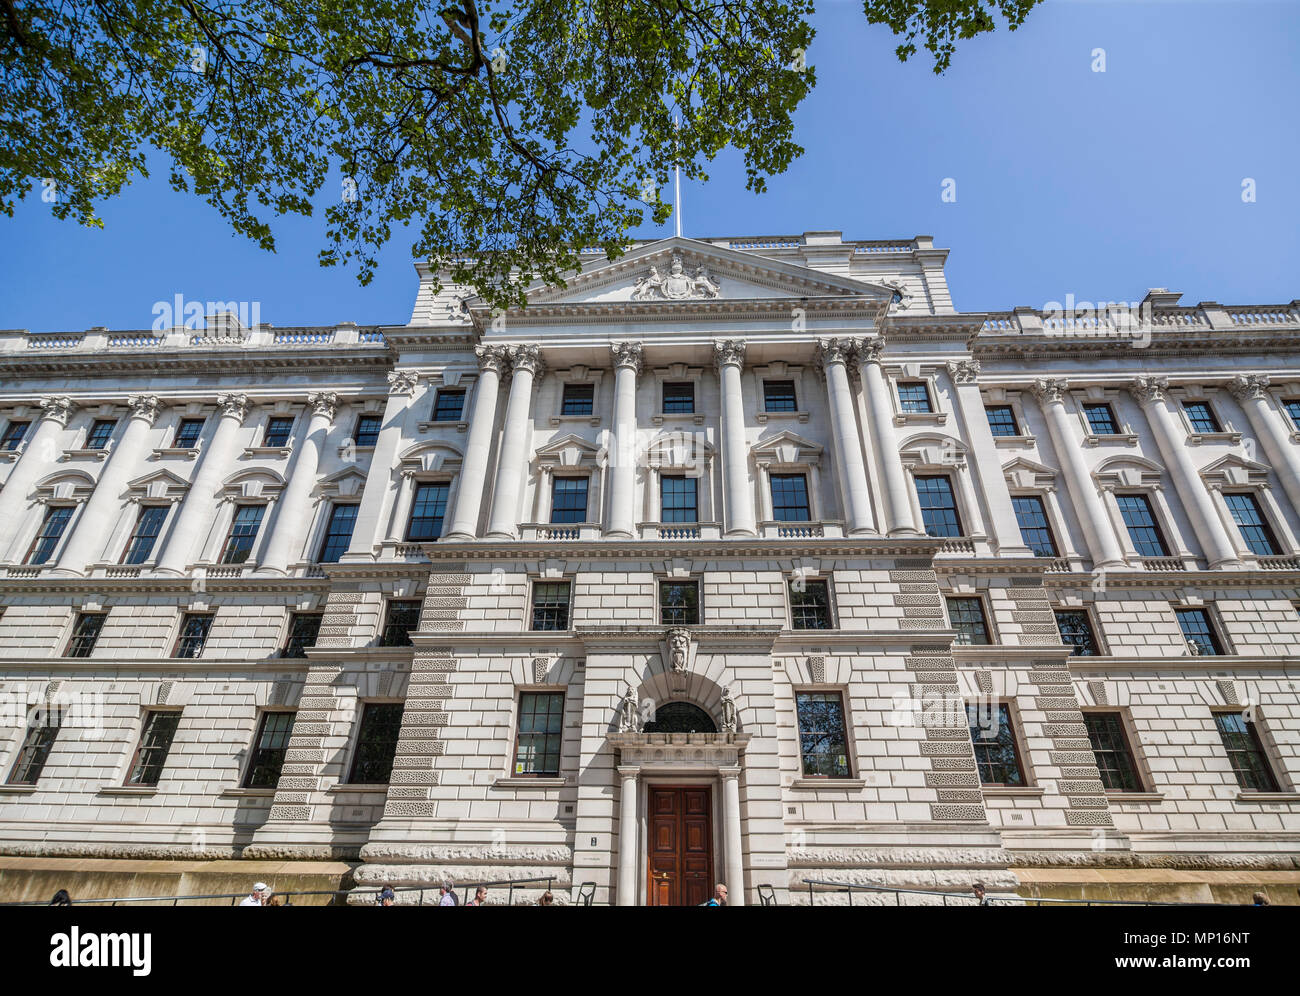 HM Treasury government building entrance, Whitehall. London, UK - Stock Image